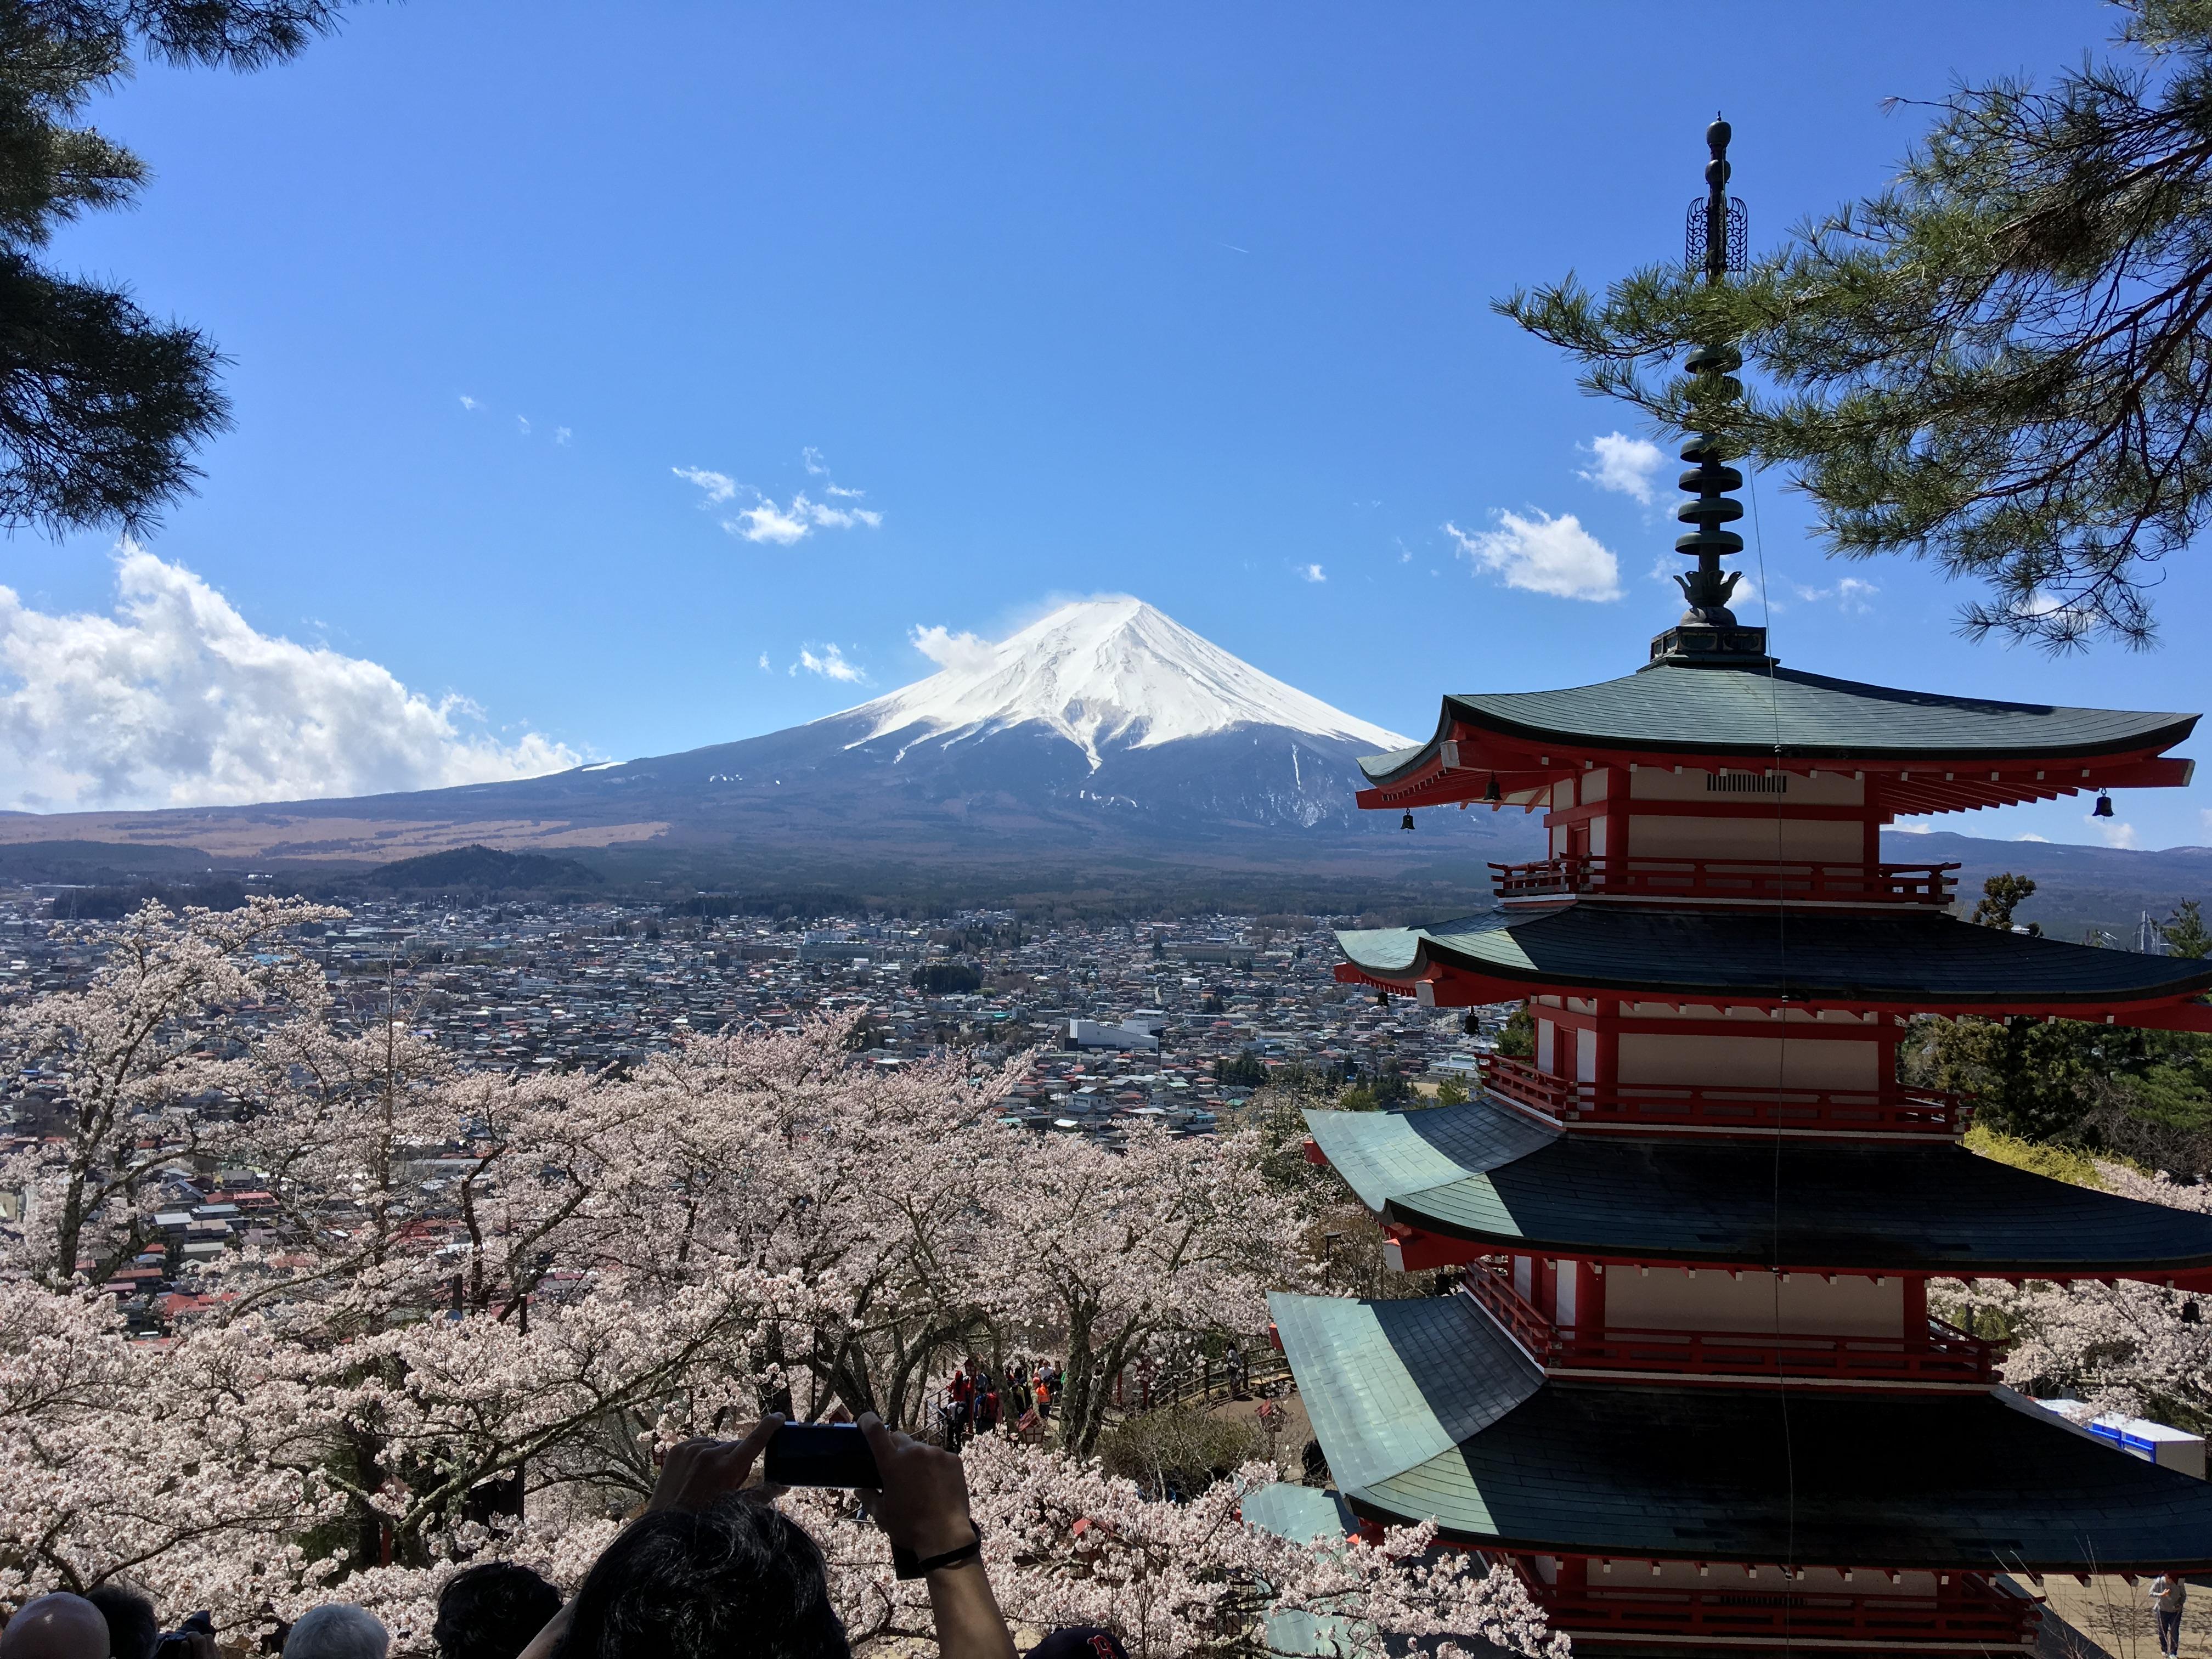 Mt. Fuji from Akarakurayama Sengen Park